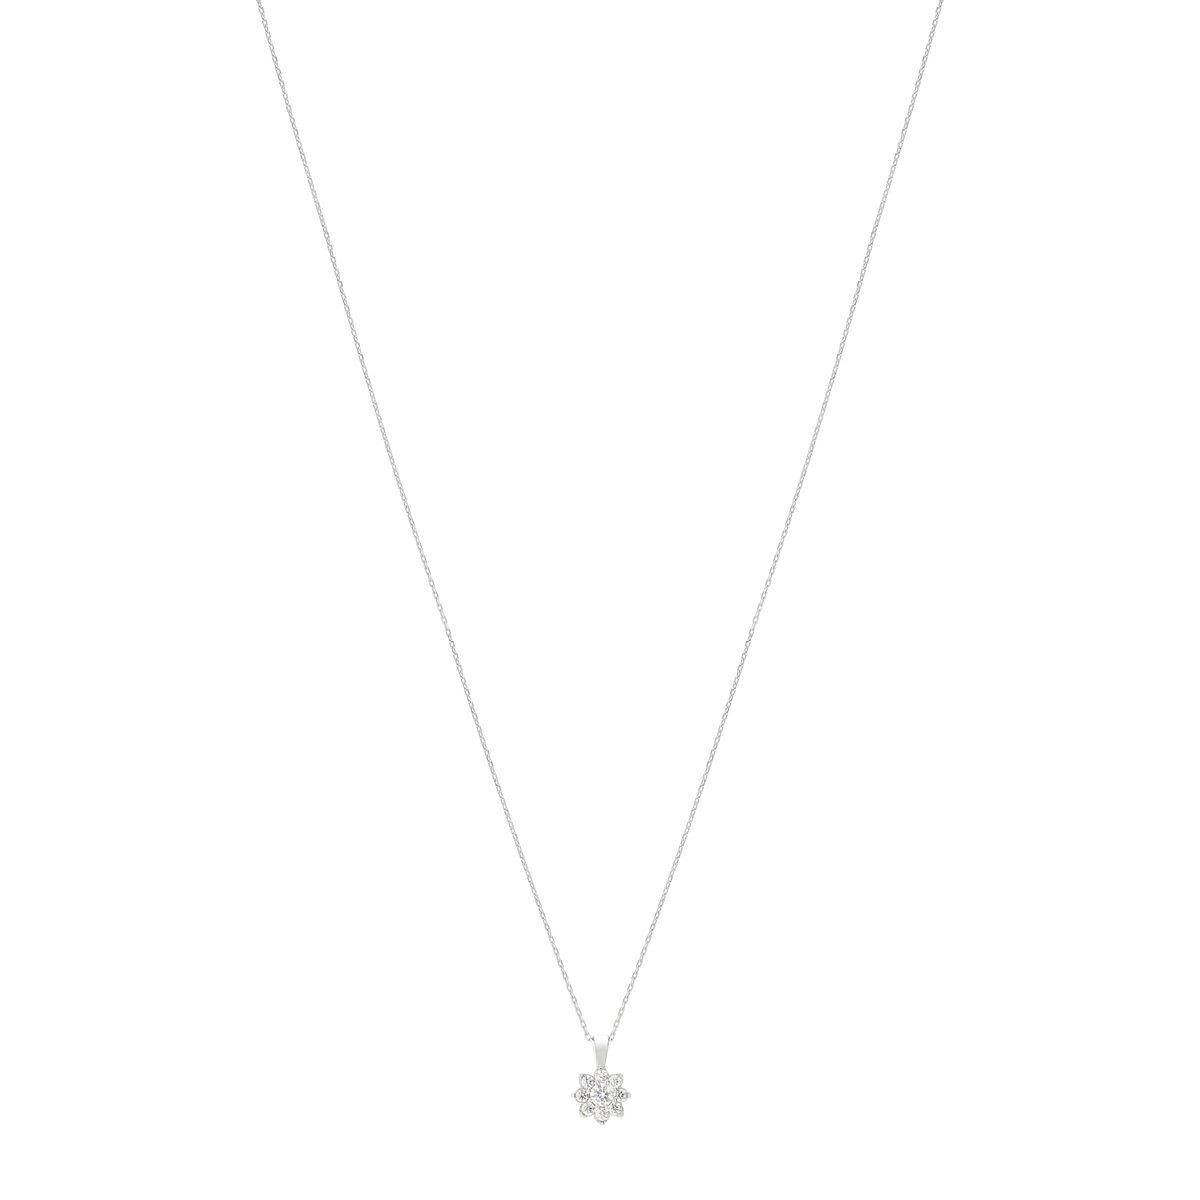 MATY Collier or 750 blanc fleur diamants synthétiques 0,25 carat 42 cm- MATY